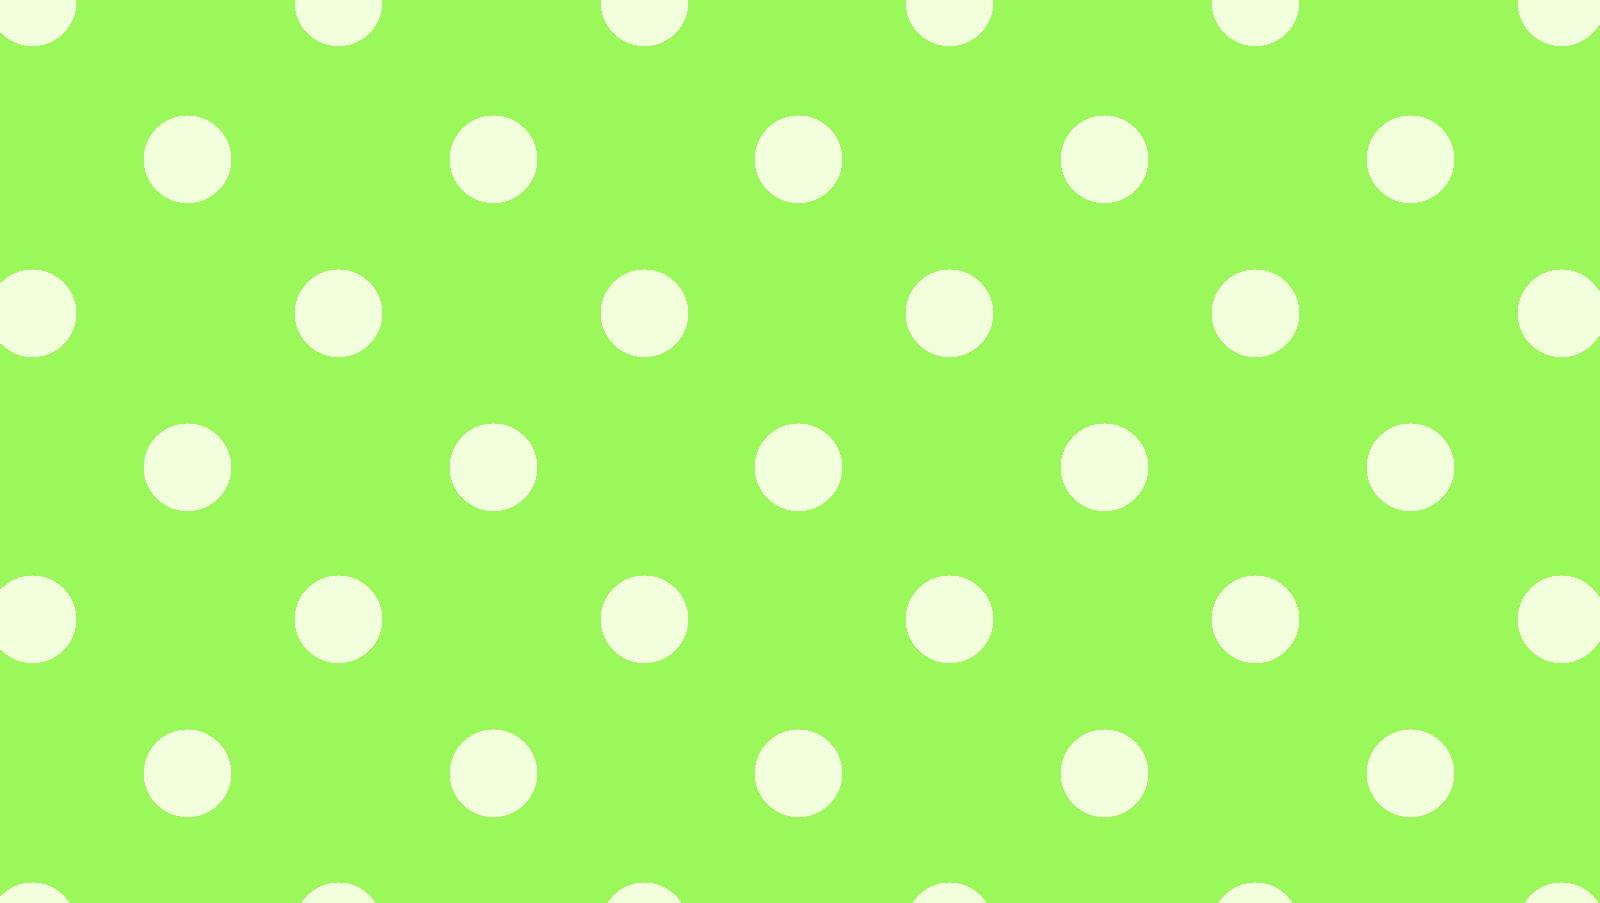 polka dot wallpaper 3031 1600x903 px hdwallsourcecom